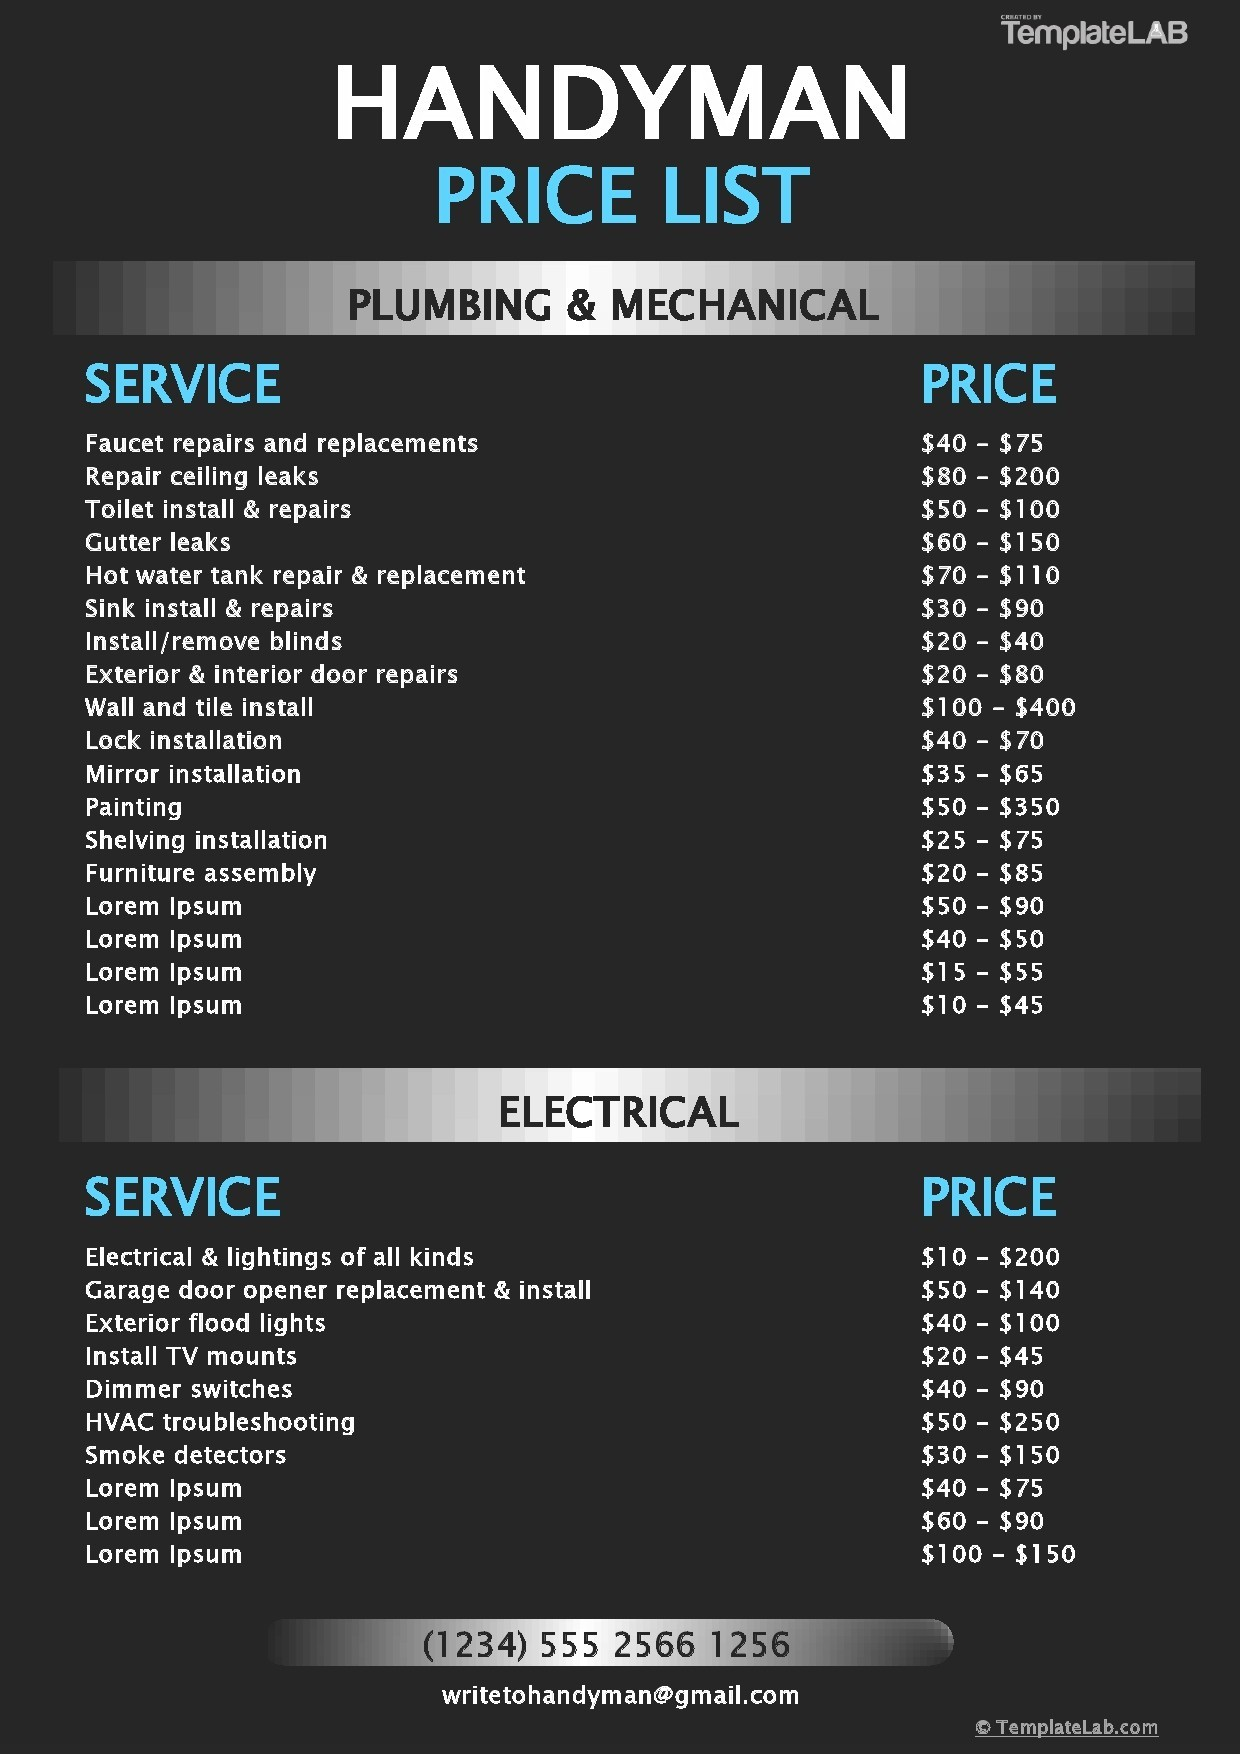 Free Handyman Price List Template - TemplateLab.com